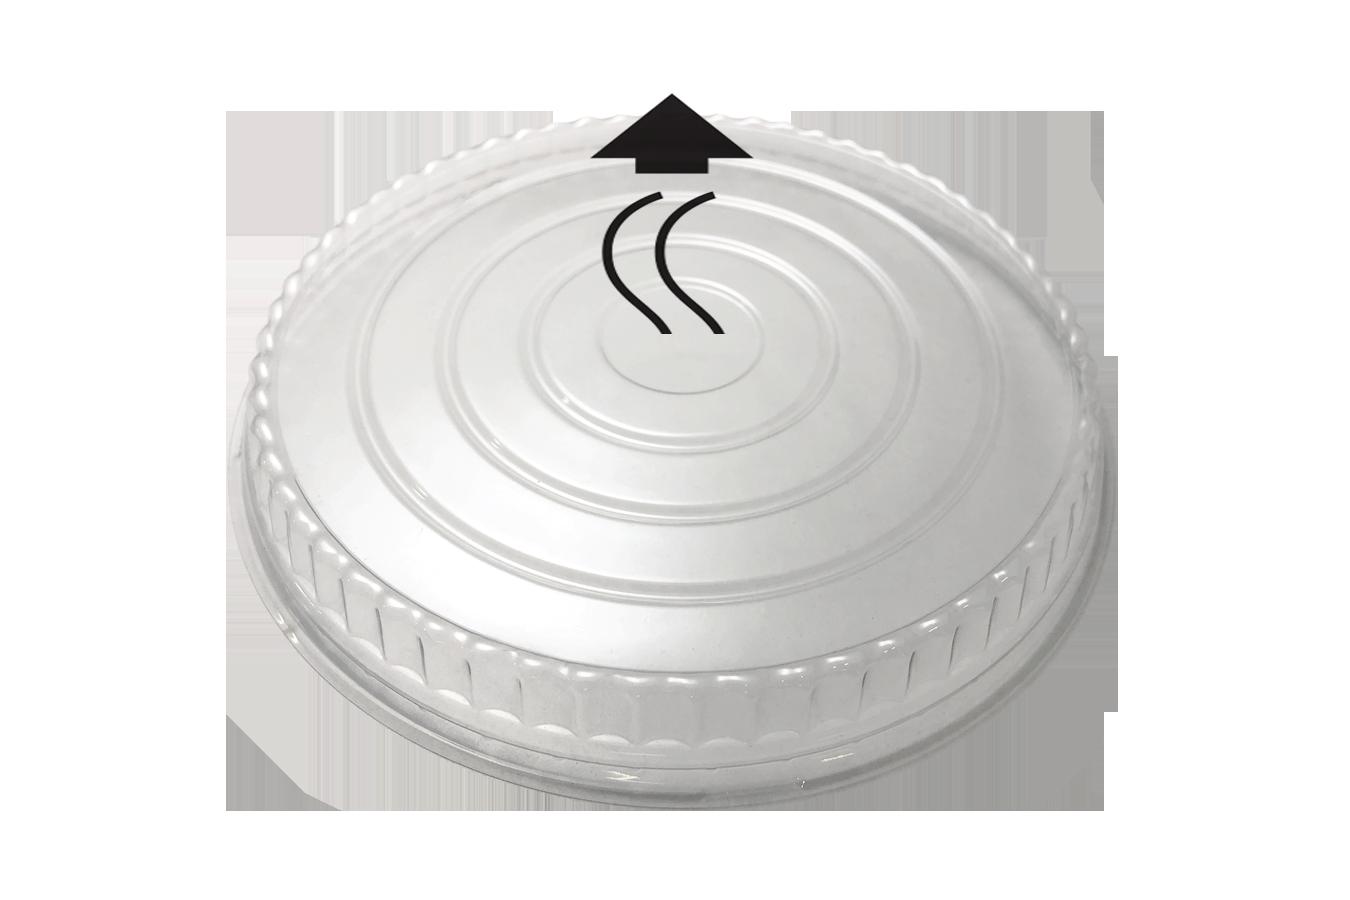 Line art illustration of clear transparent plastic vented OPS lid for Ecopax 32 oz Athena paper bowl